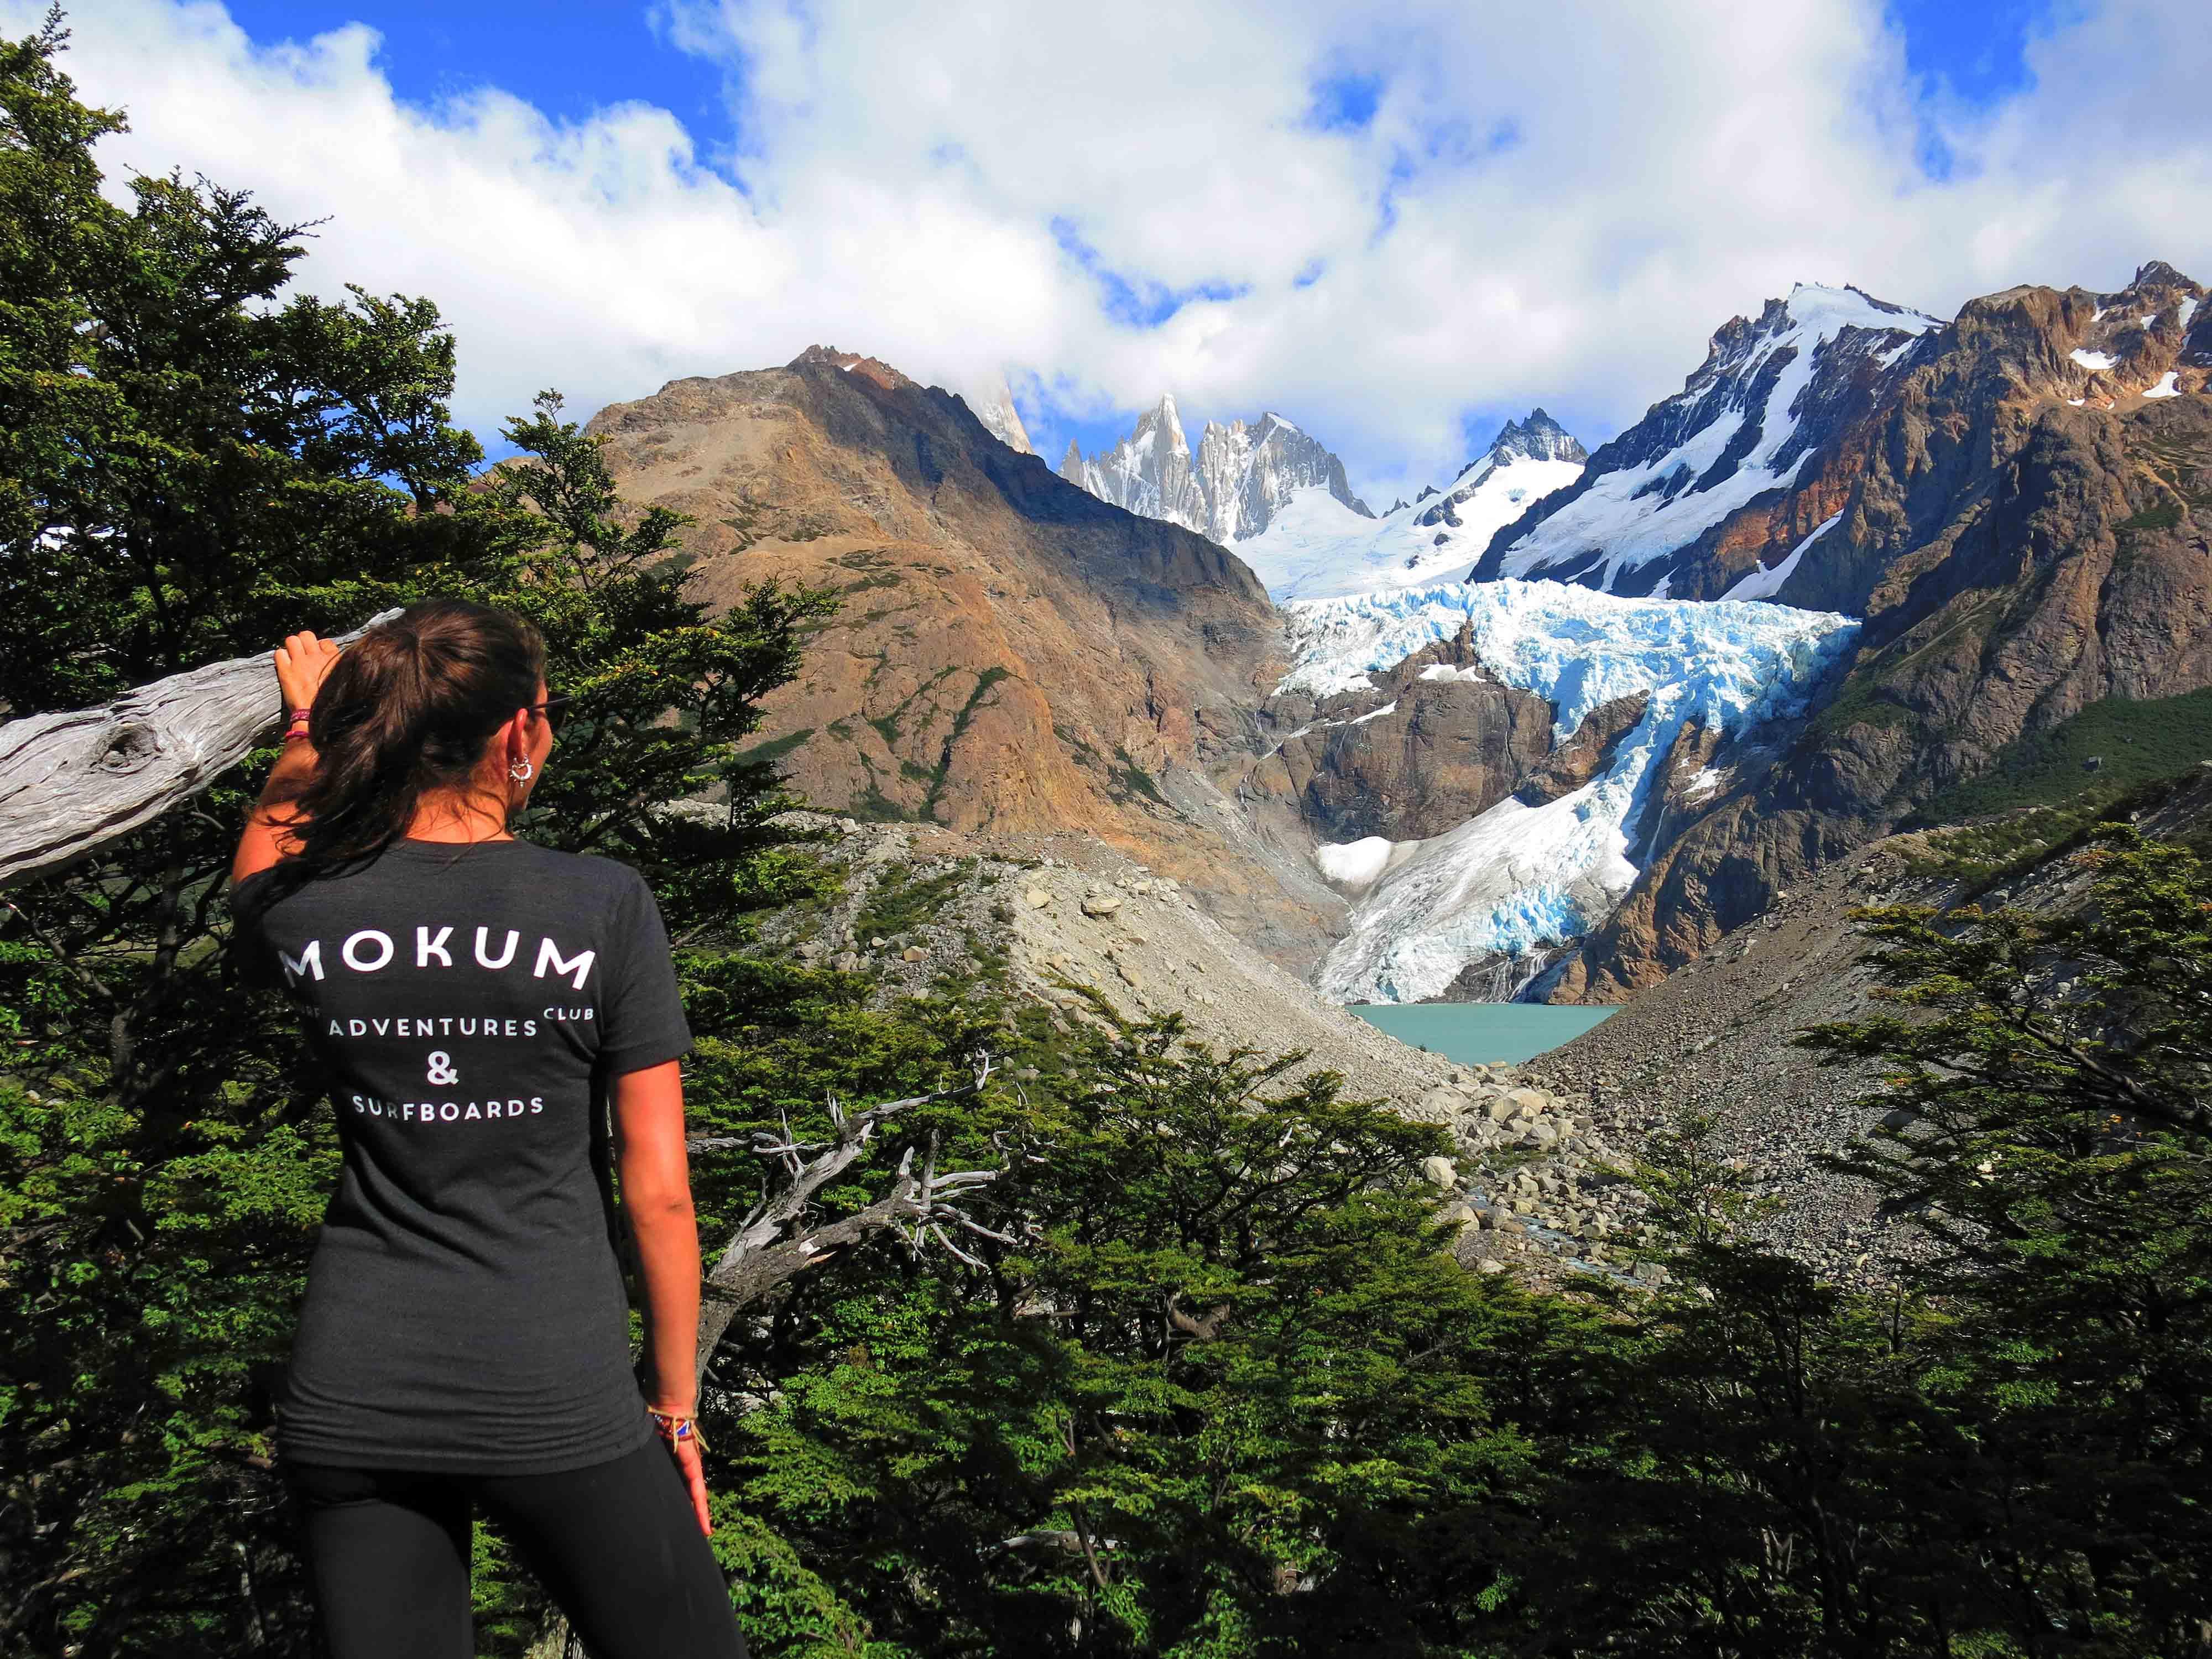 mount fitzroy el chalten argentina south america